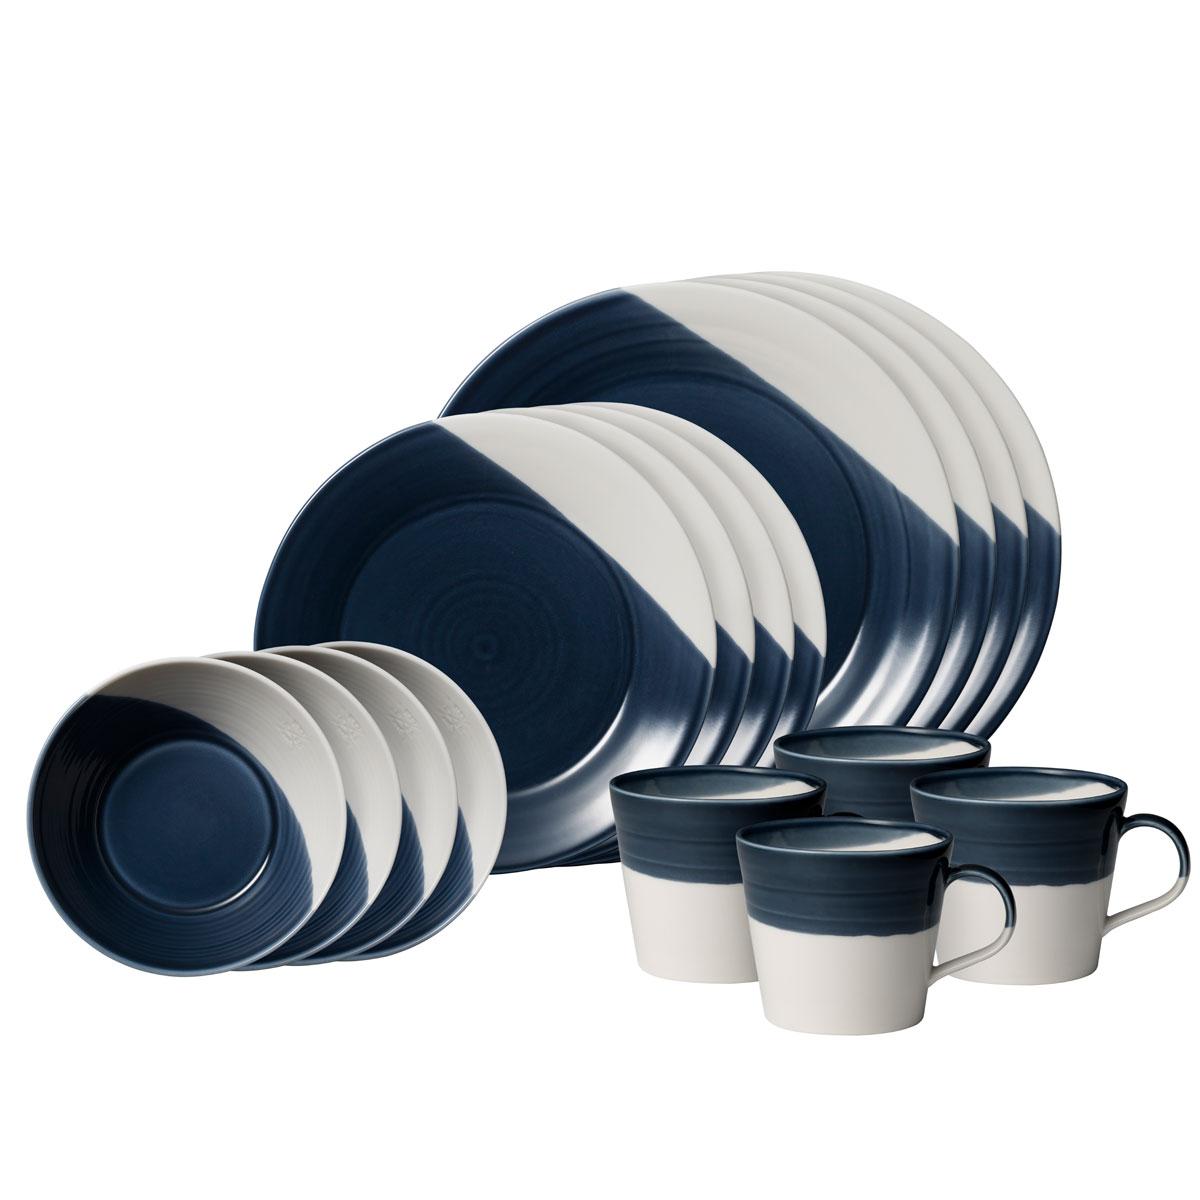 Royal Doulton Bowls of Plenty 16-Piece Set Dark Blue